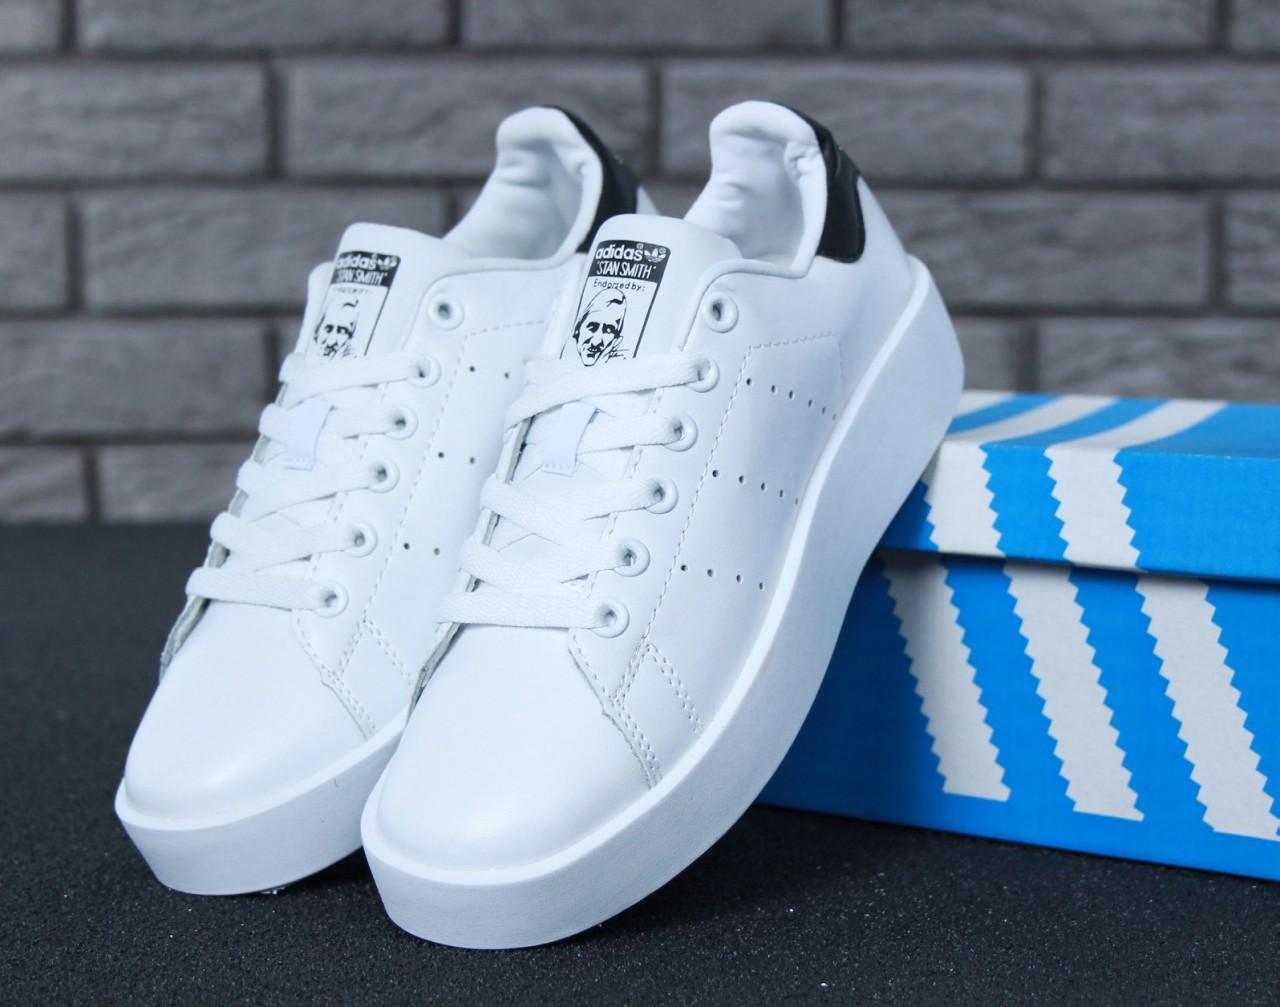 2f83178bde62 Кроссовки Adidas Stan Smith Bold купить в Киеве   Im-PoLLi - 672757072